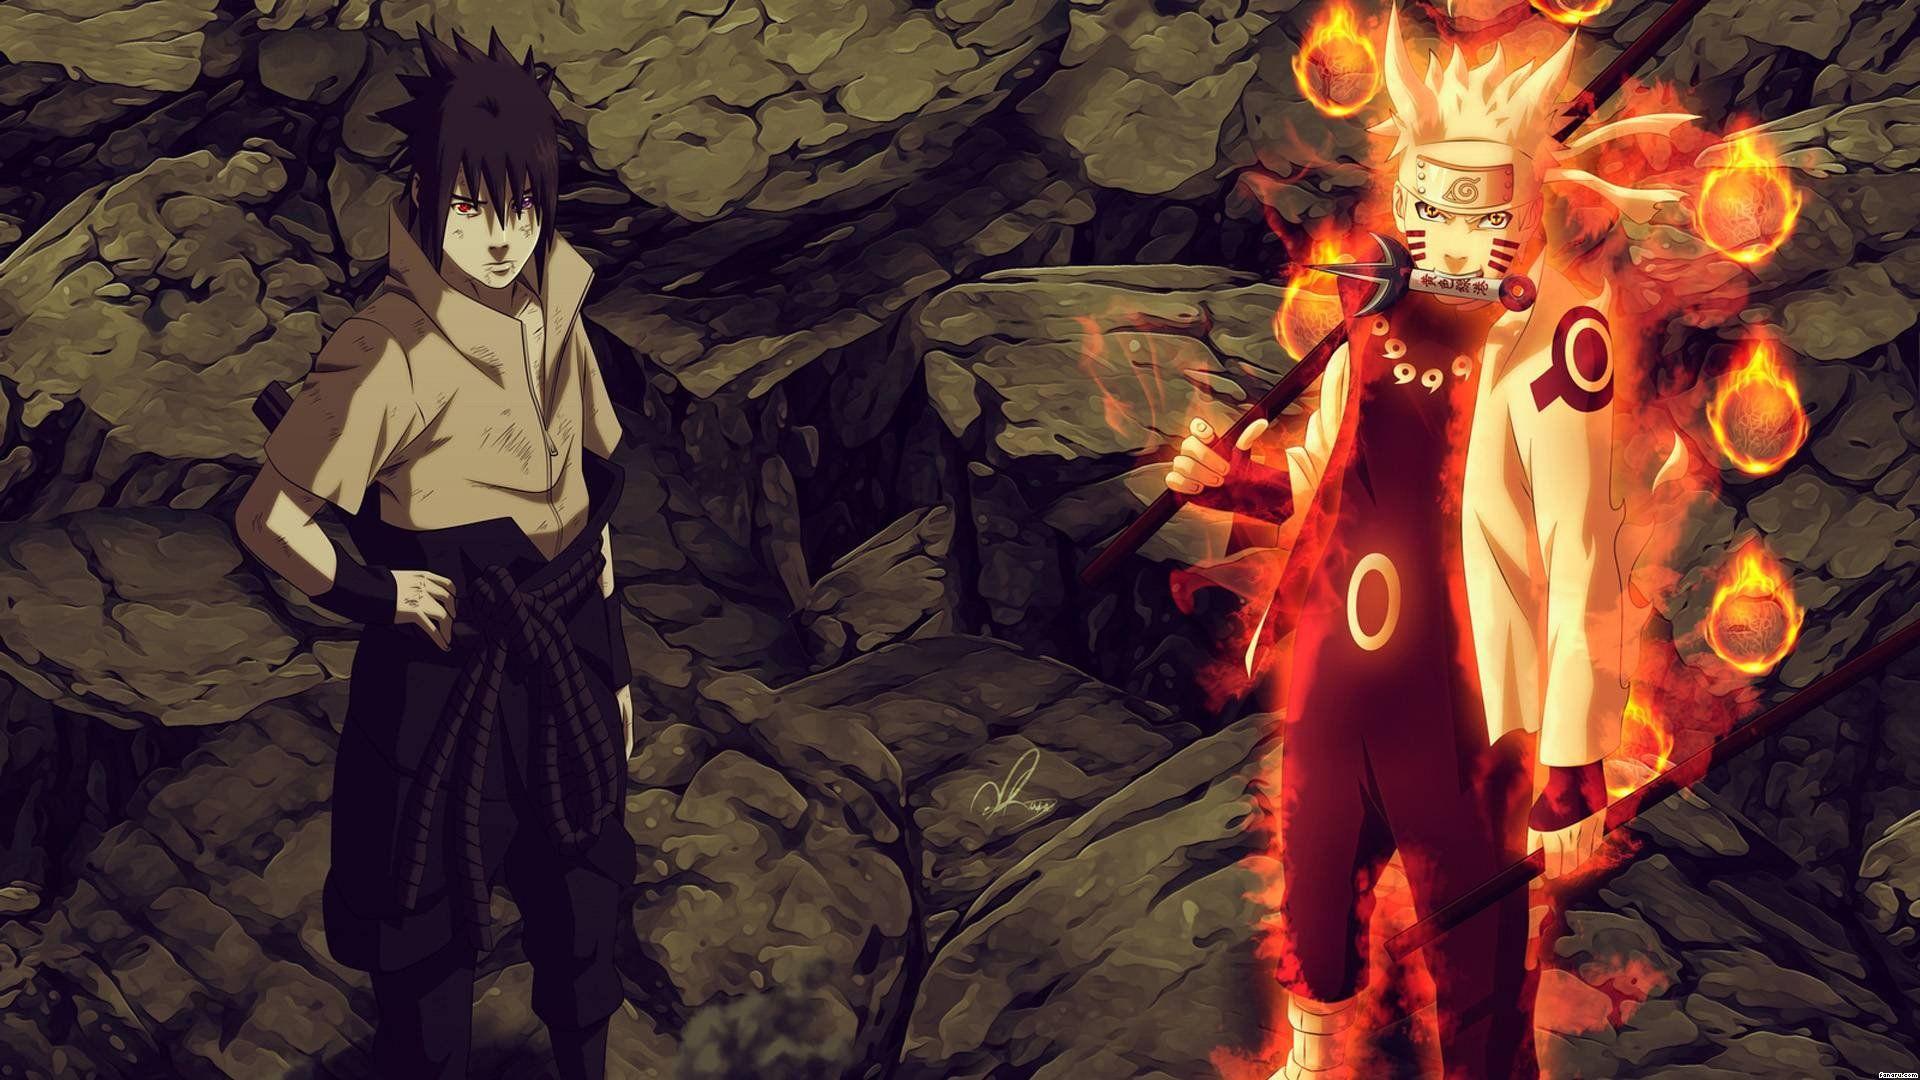 Naruto vs Sasuke Super HD HD desktop wallpaper Widescreen